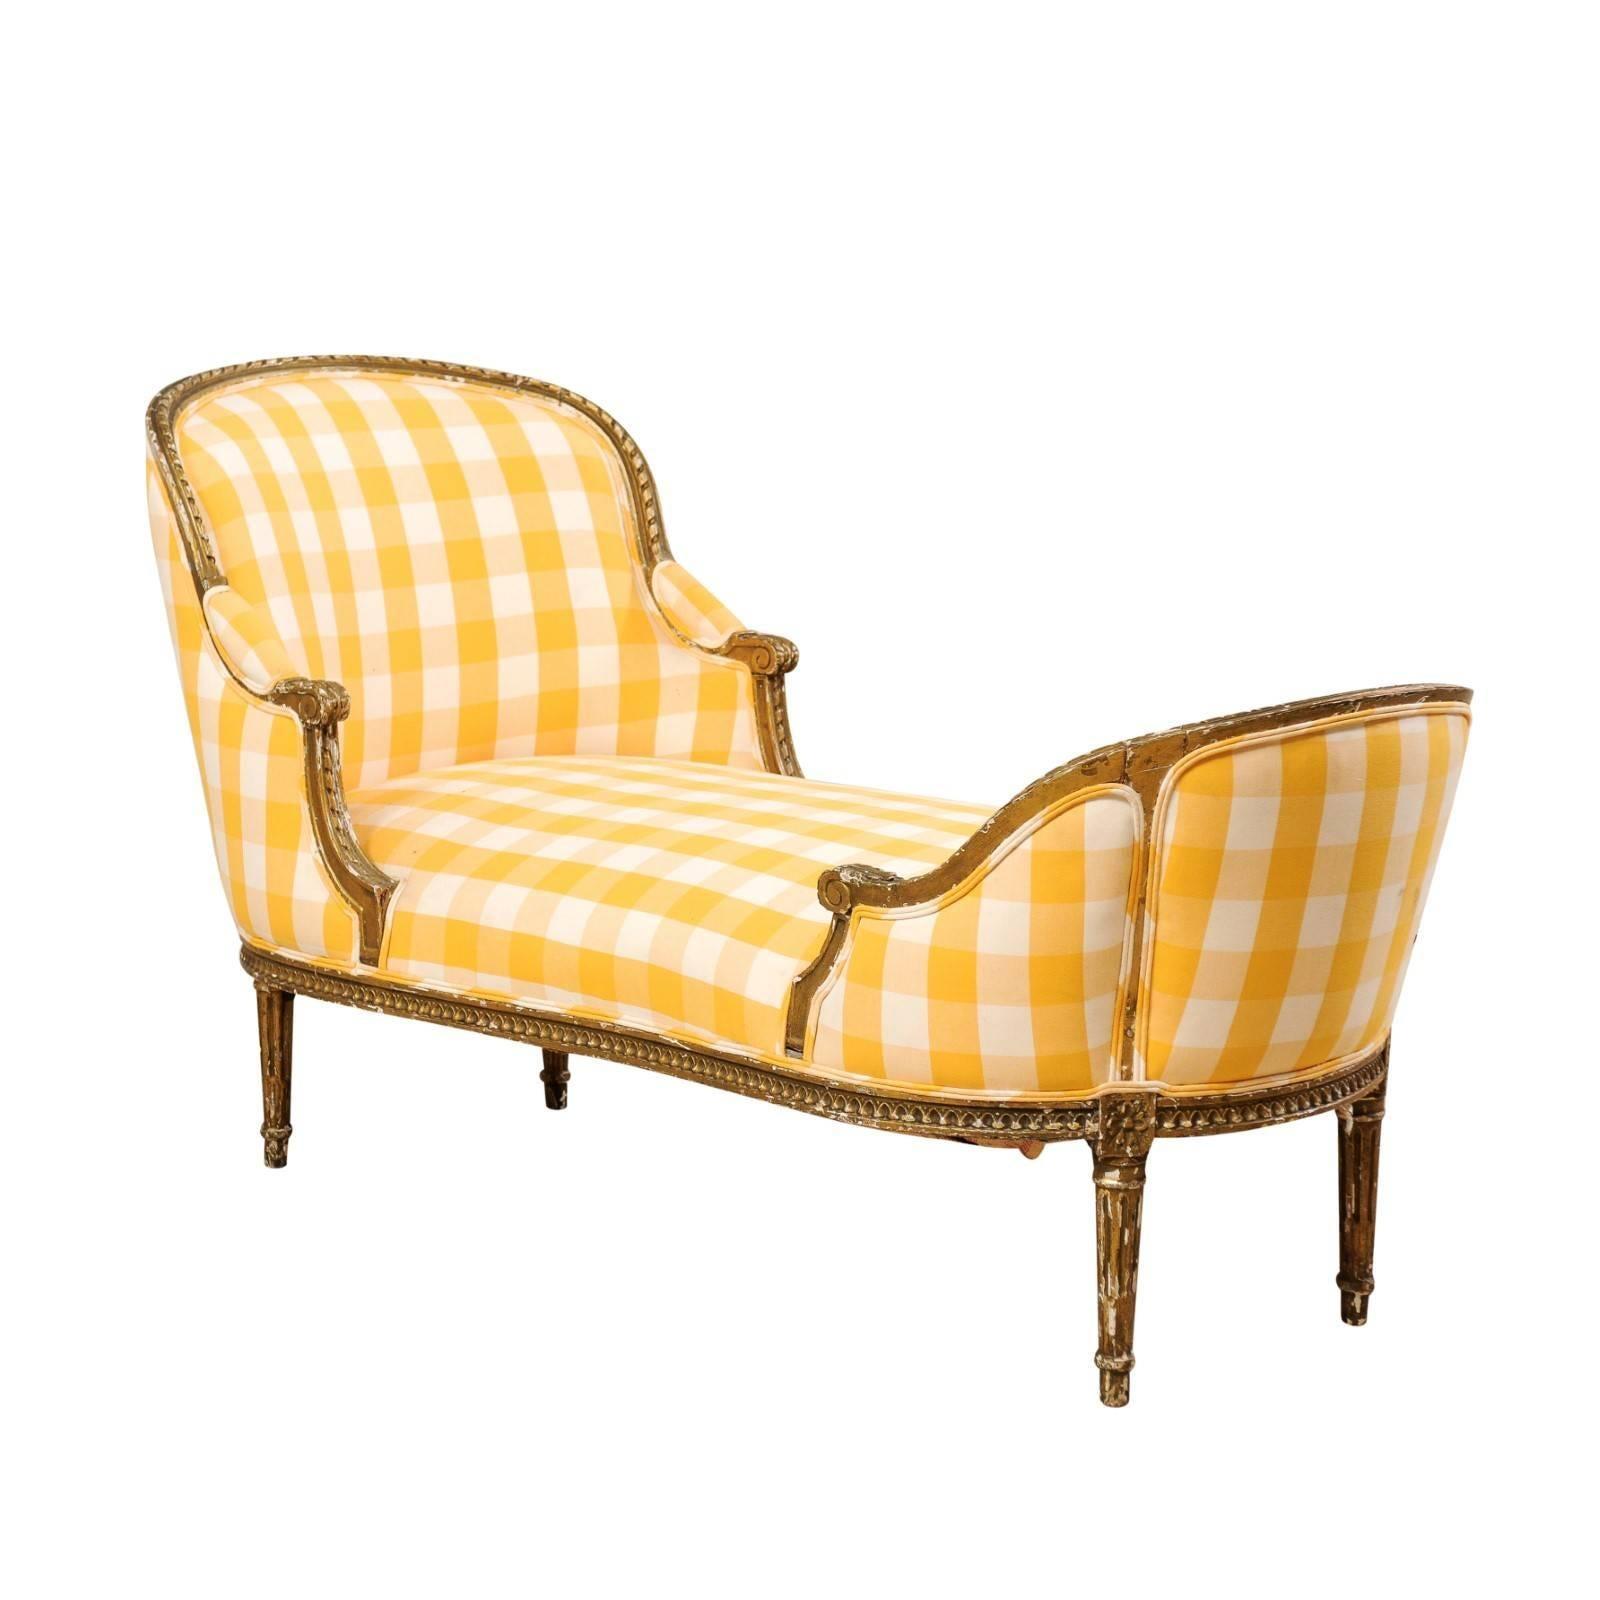 French Louis XVI Style Duchesse en Bateau Chaise Lounge Chair, Late 19th C.